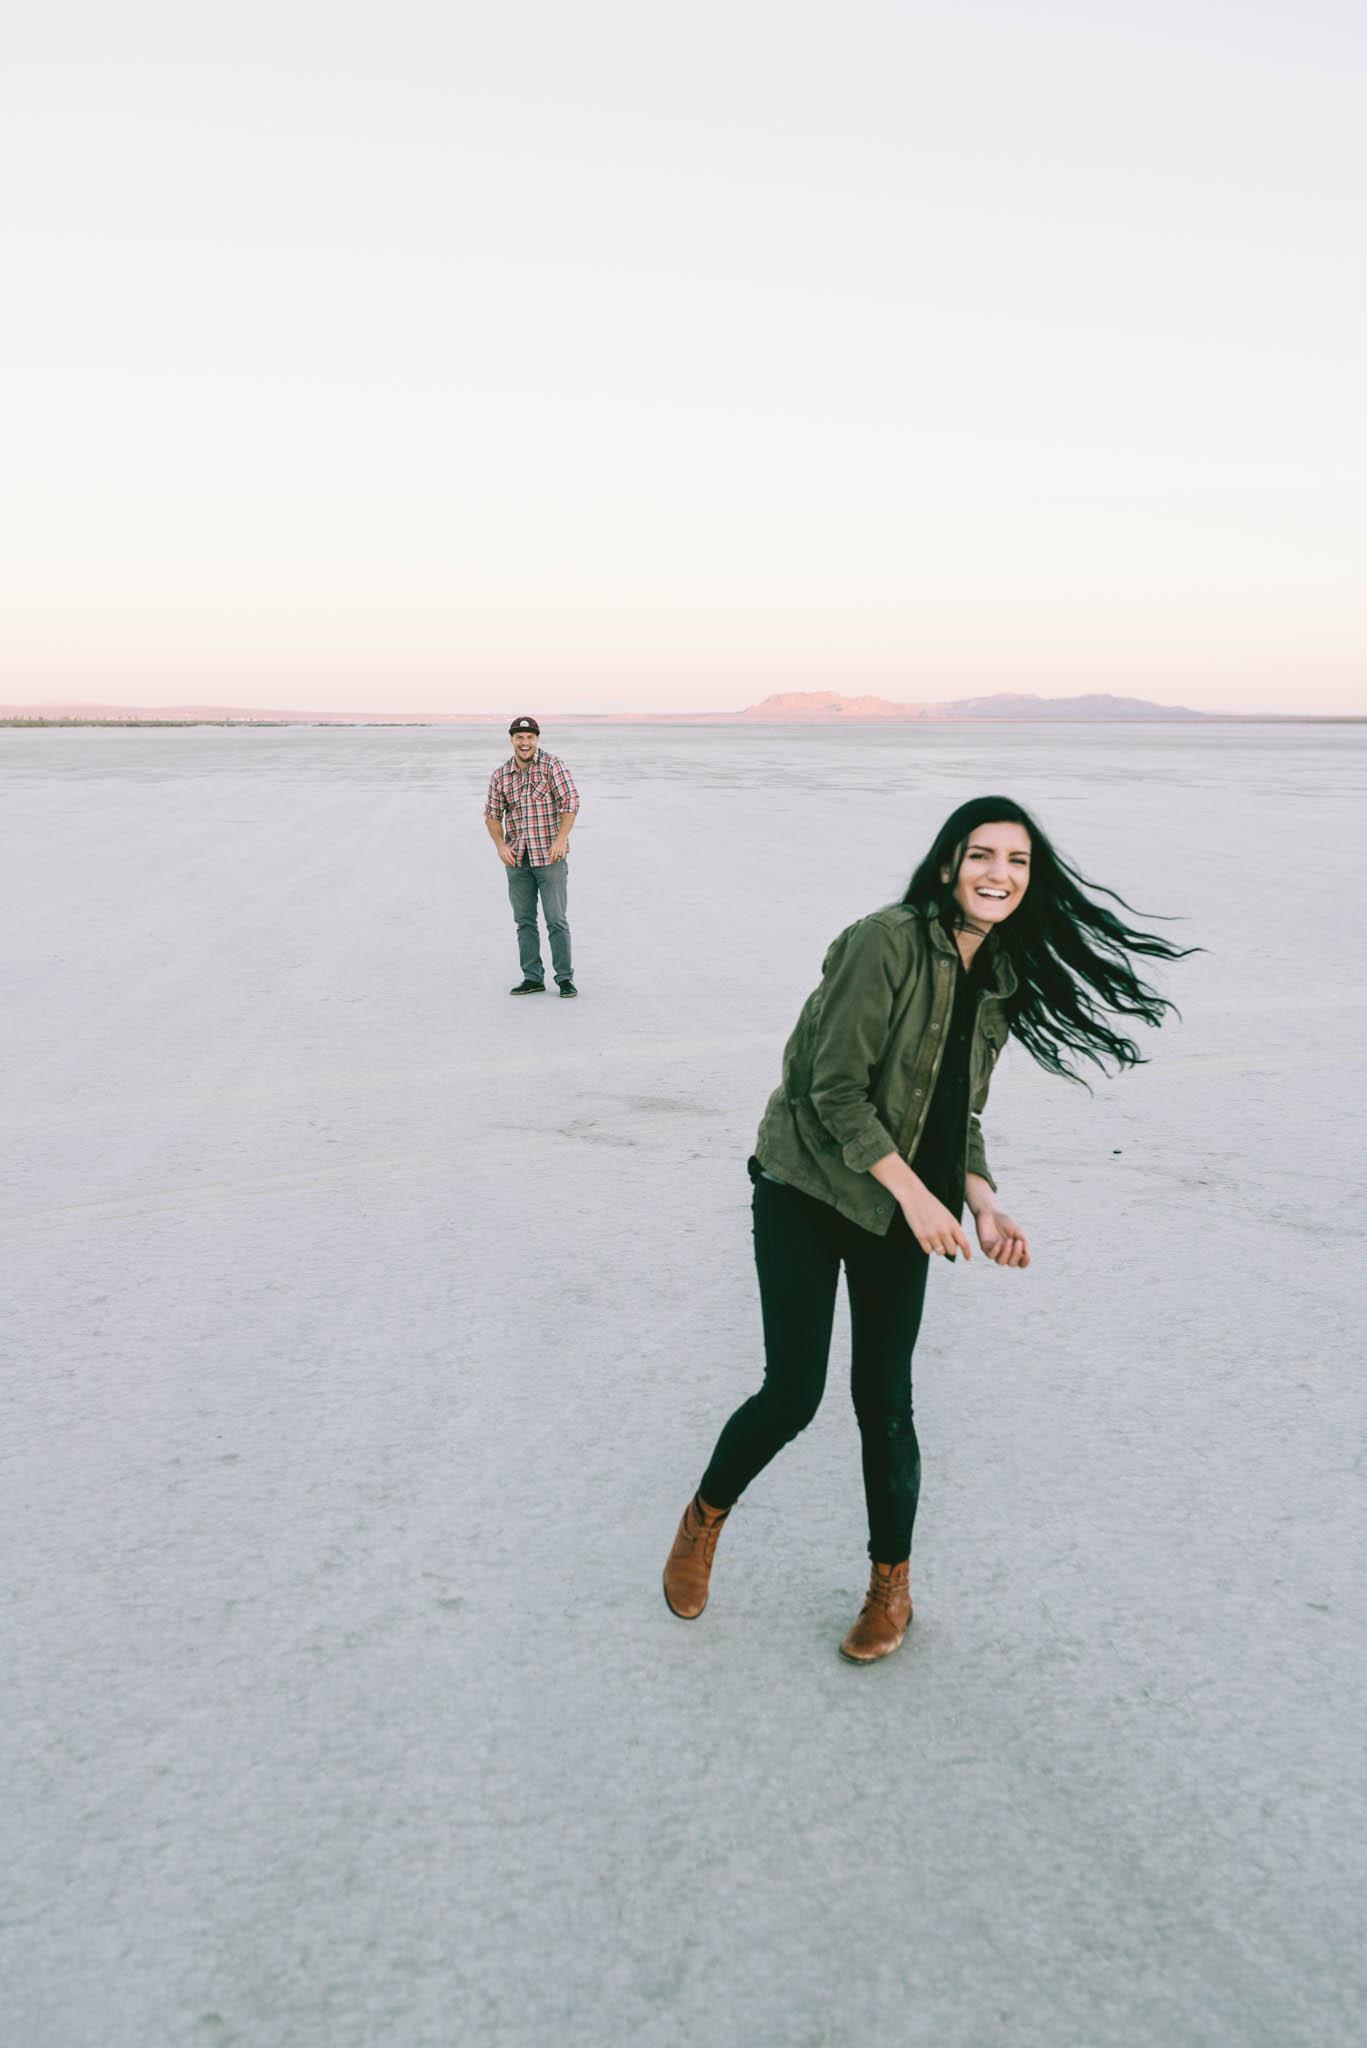 ©The Ryans Photography - Sunrise Salt Flats, Southern California-7.jpg